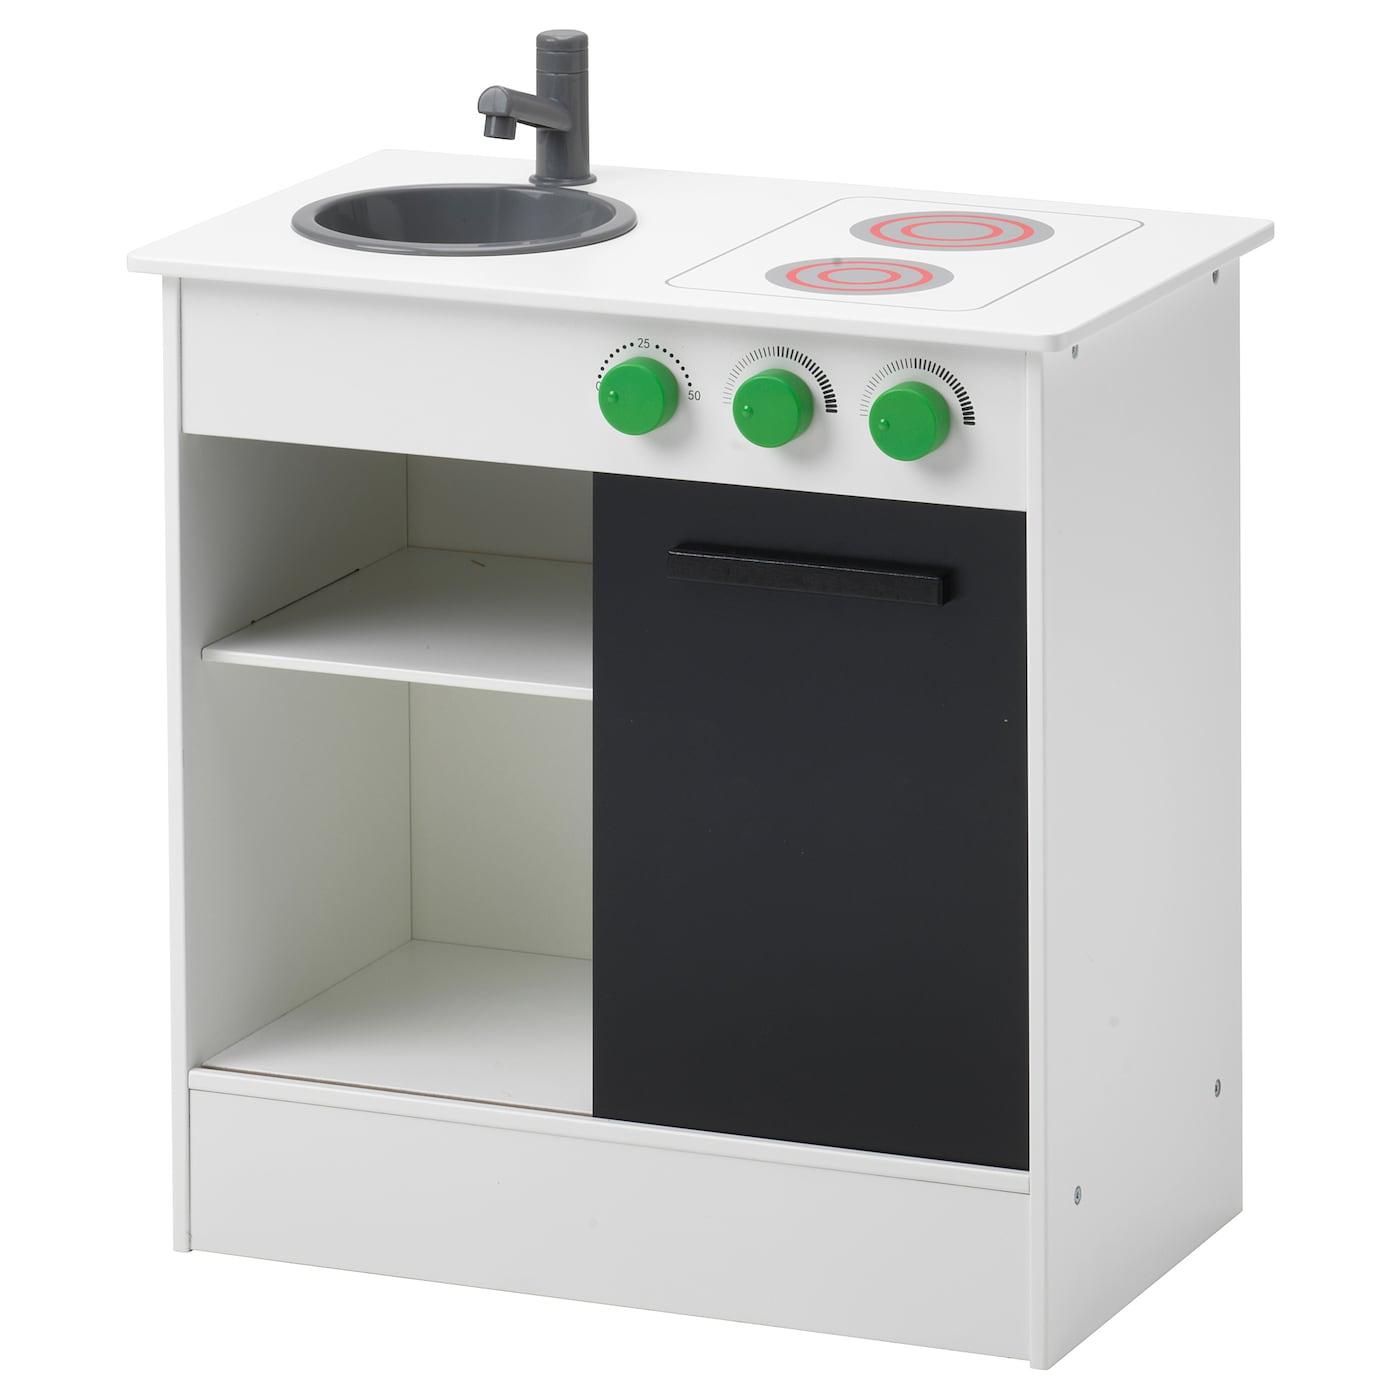 NYBAKAD Play kitchen with sliding door - white 4x4x4 cm